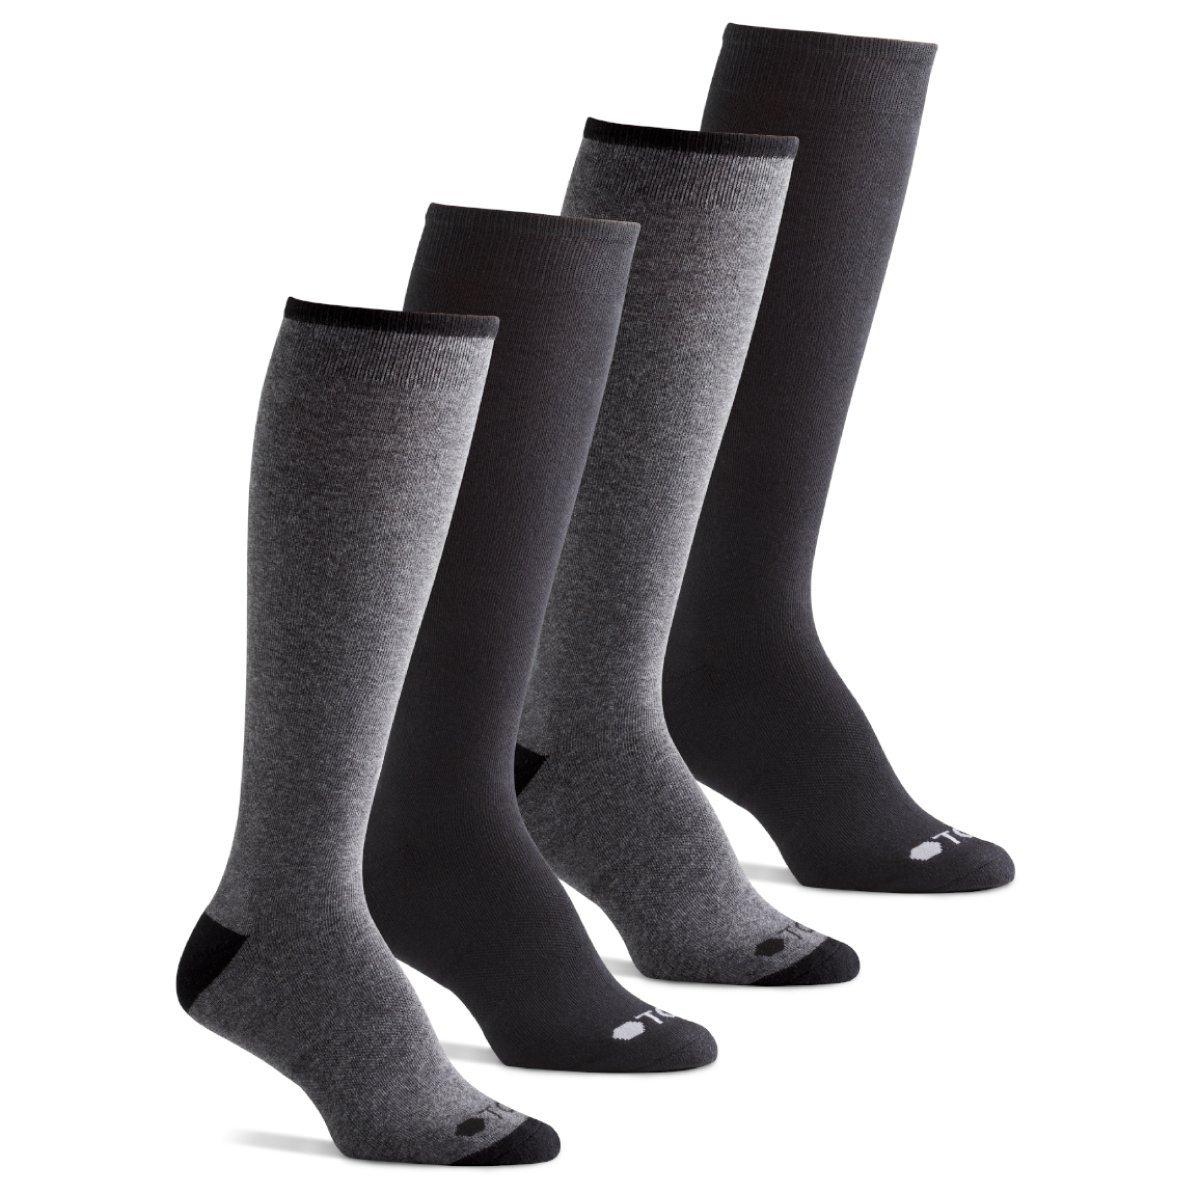 TCS Women's Premium Comfort Lifestyle Casual Knee High Socks - Charcoal/Black, Women's Shoe Size 6-10 (US)